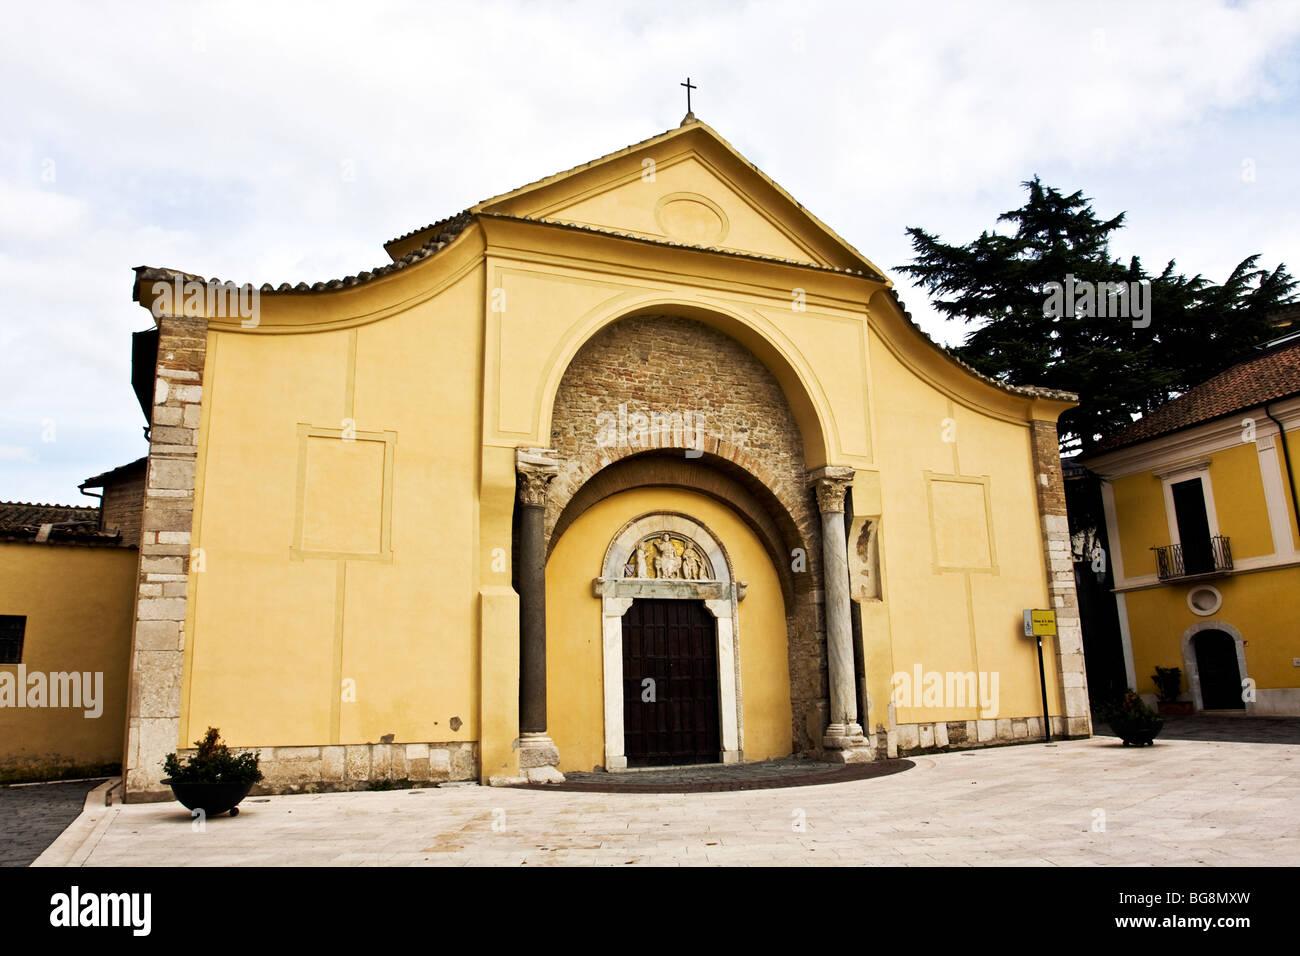 Church od Santa Sofia Benevento, Archeological Museum - Unesco official candidate Campania, Italy Stock Photo